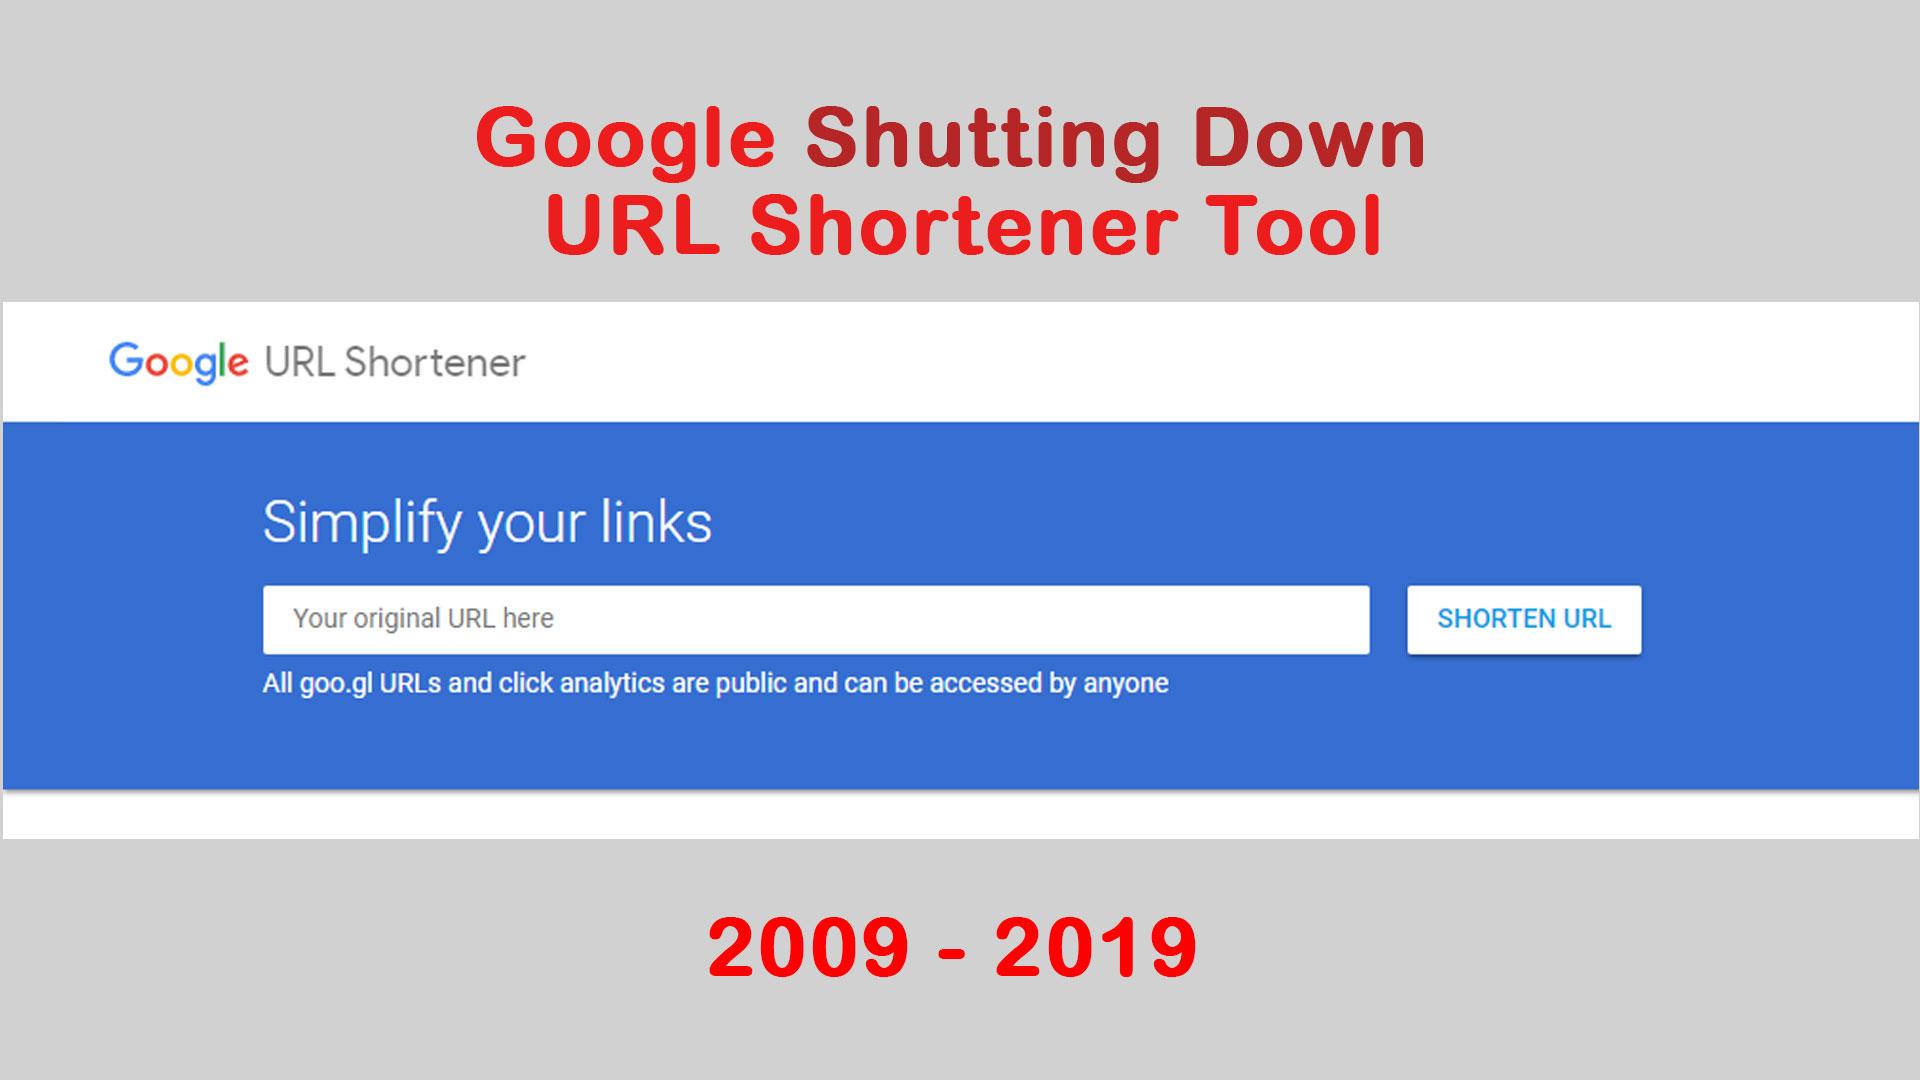 google shutting down url shortener